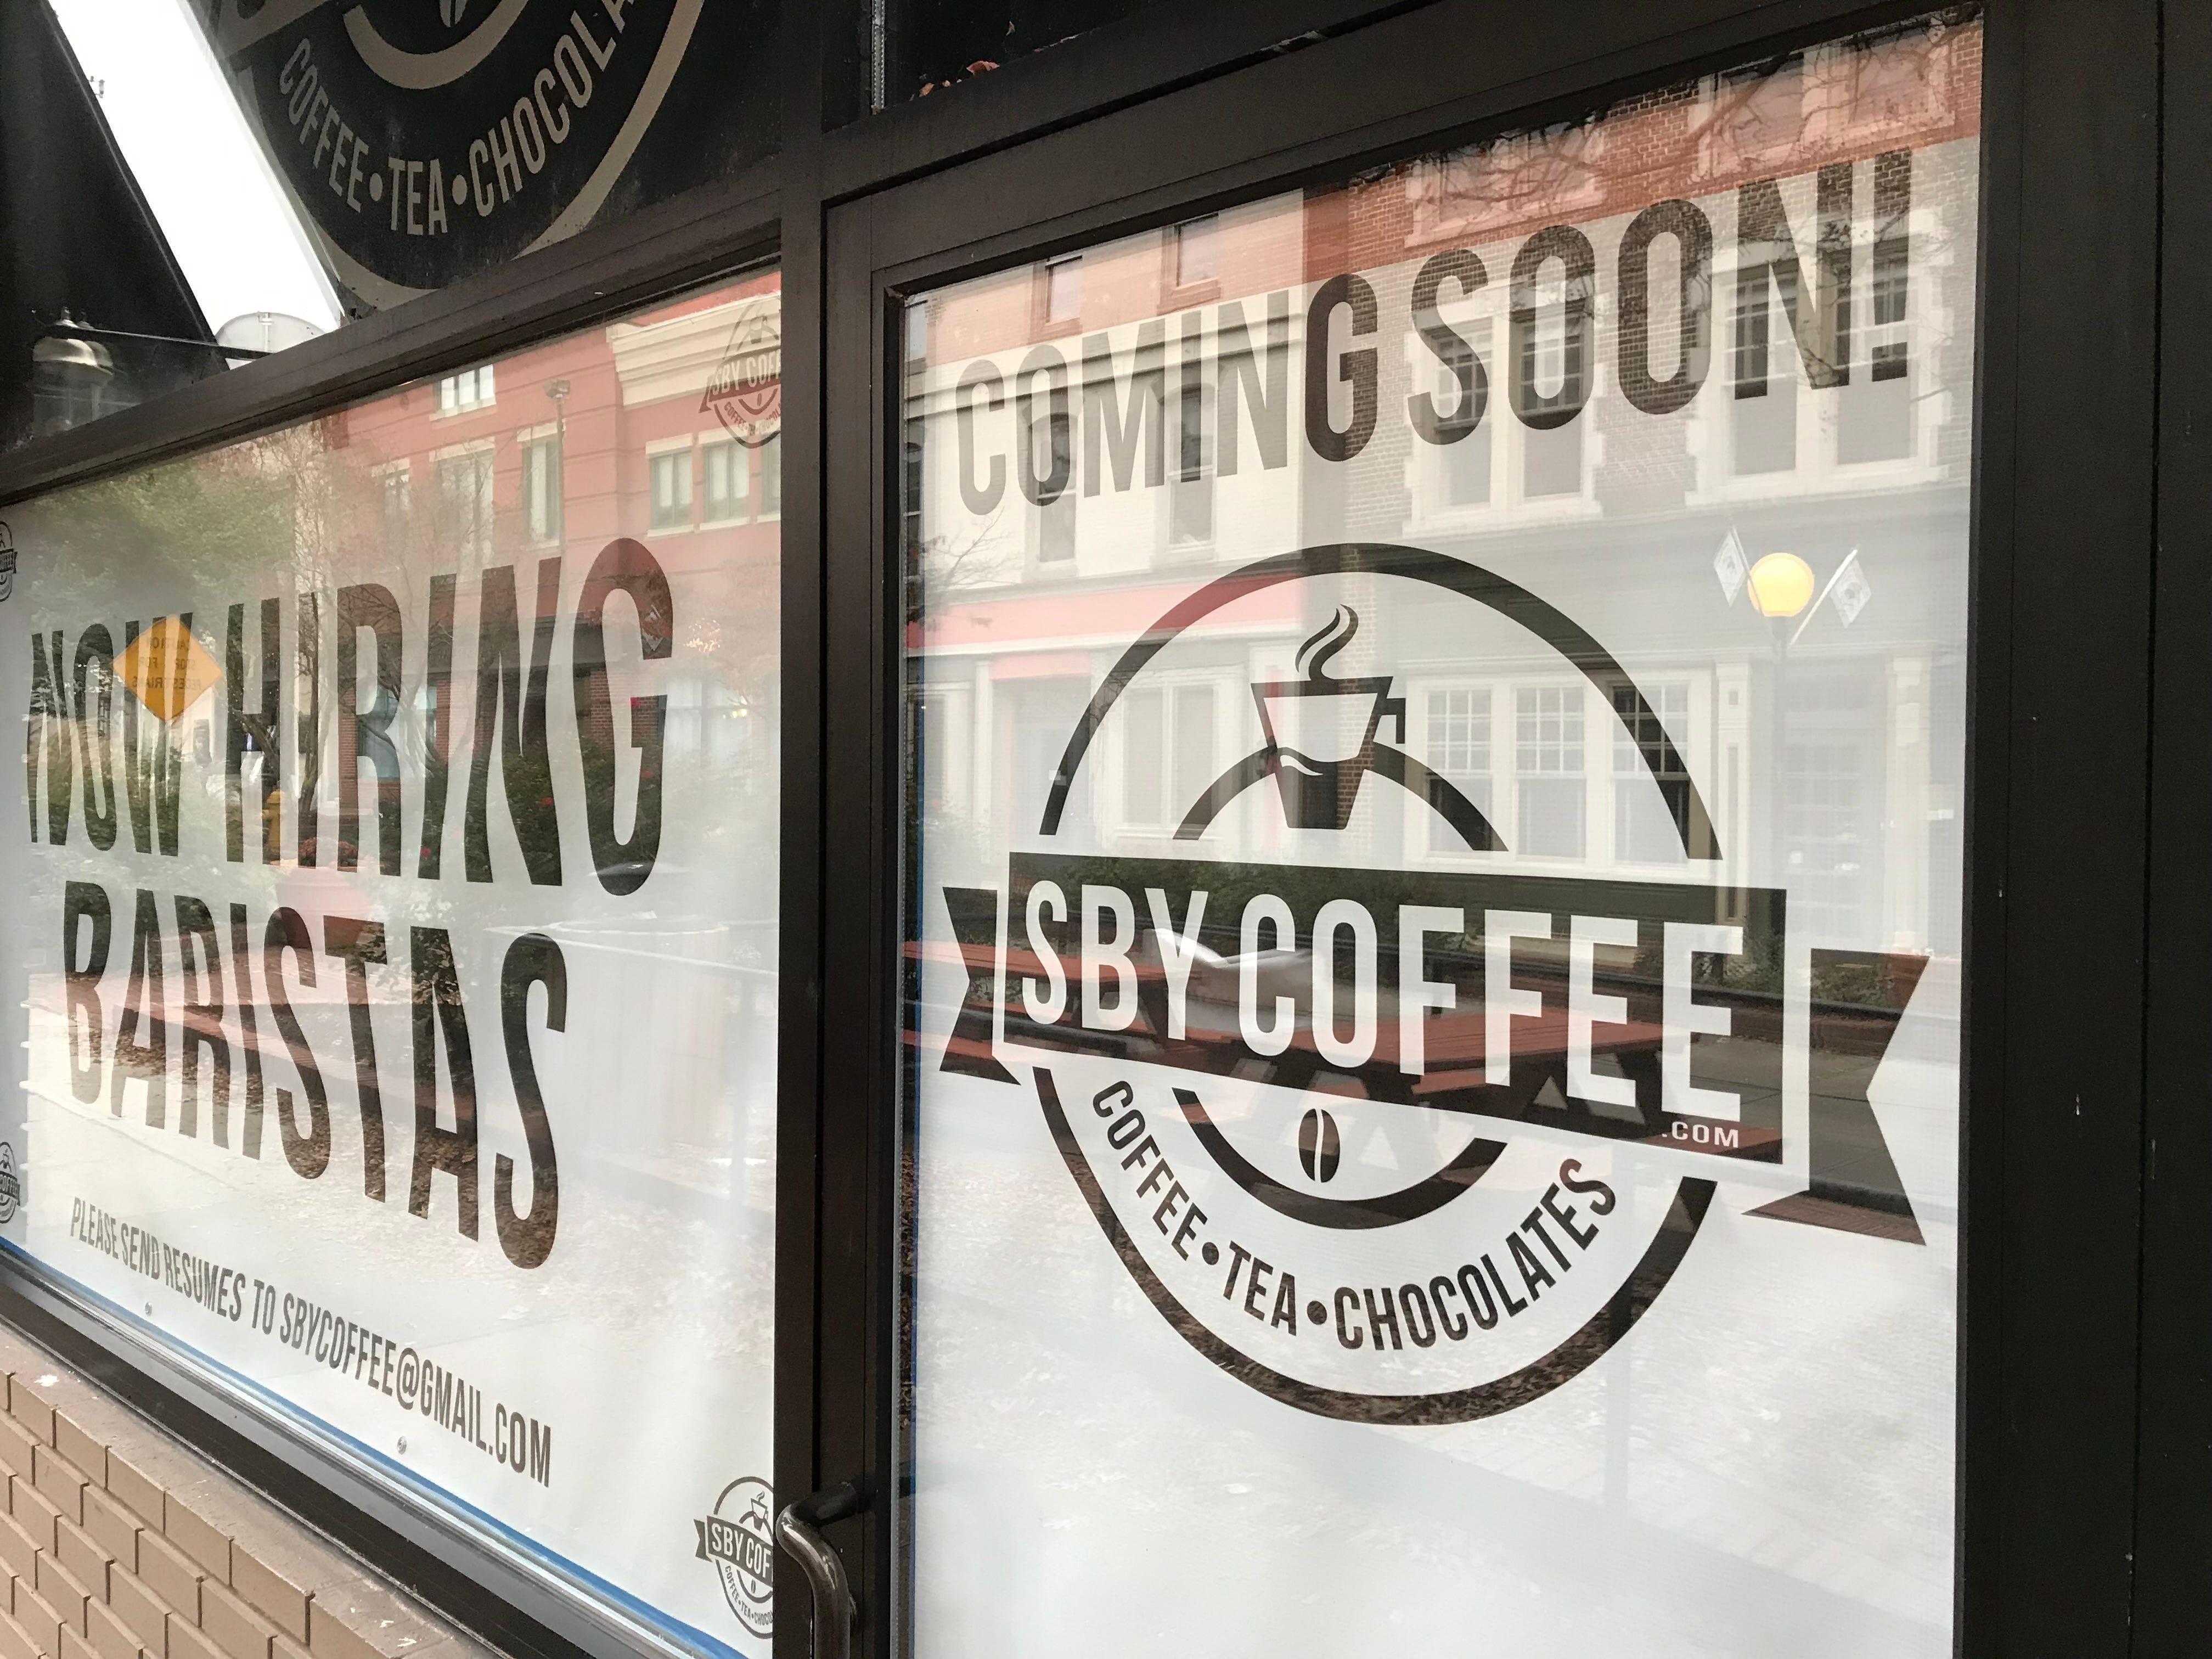 Salisbury's Main Roots becoming new coffee, chocolate shop